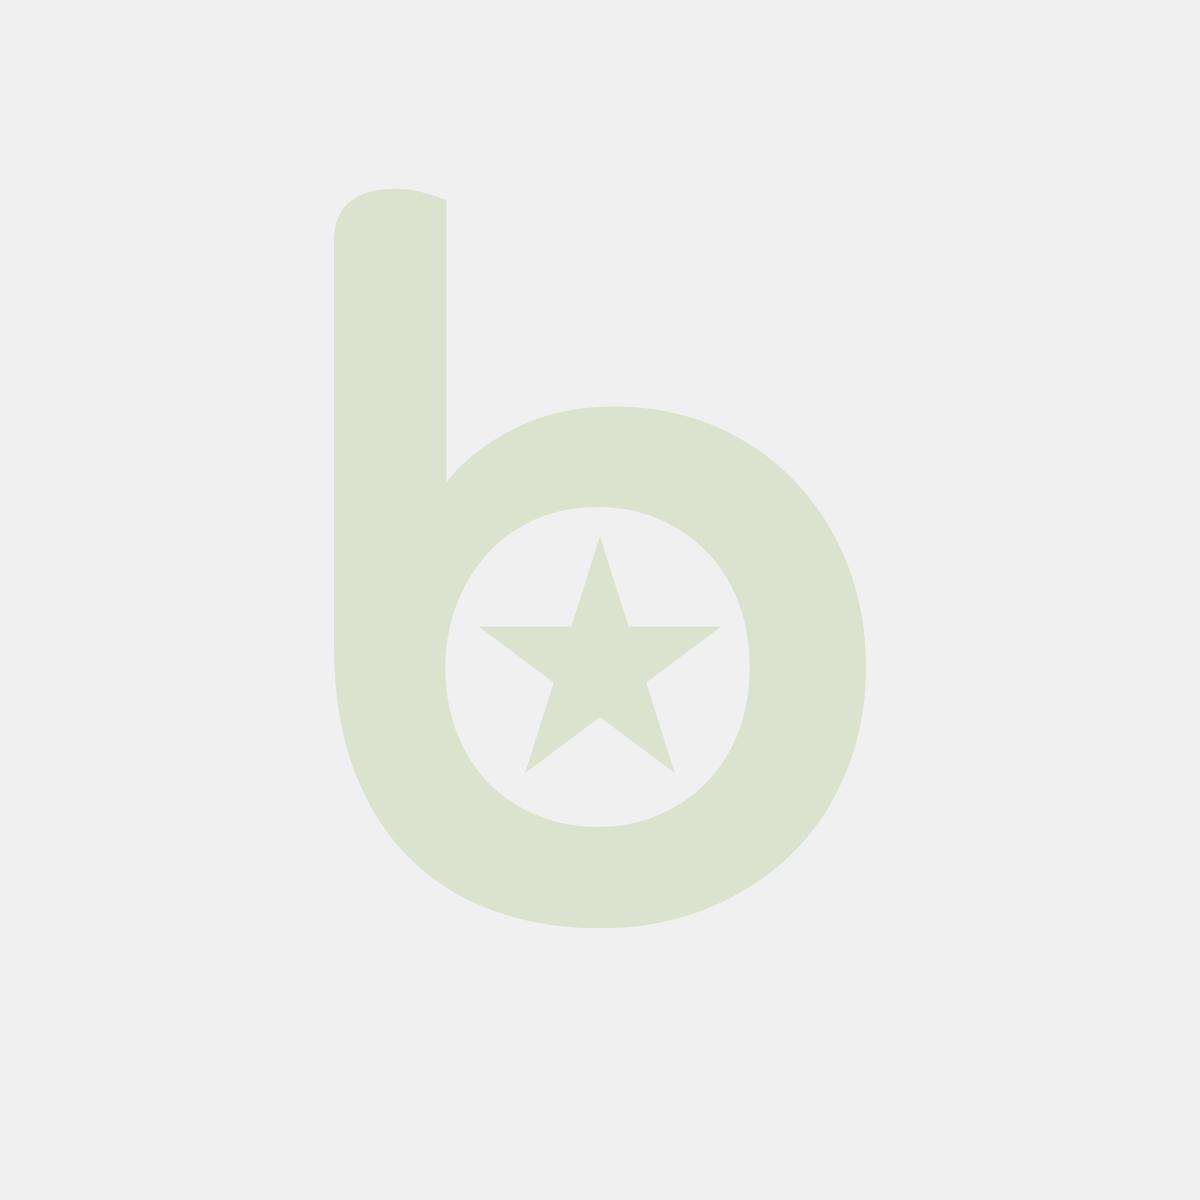 Talerz COAT&COLORS kolor: zielony, duży owalny, PP, 25 szt. w opakowaniu